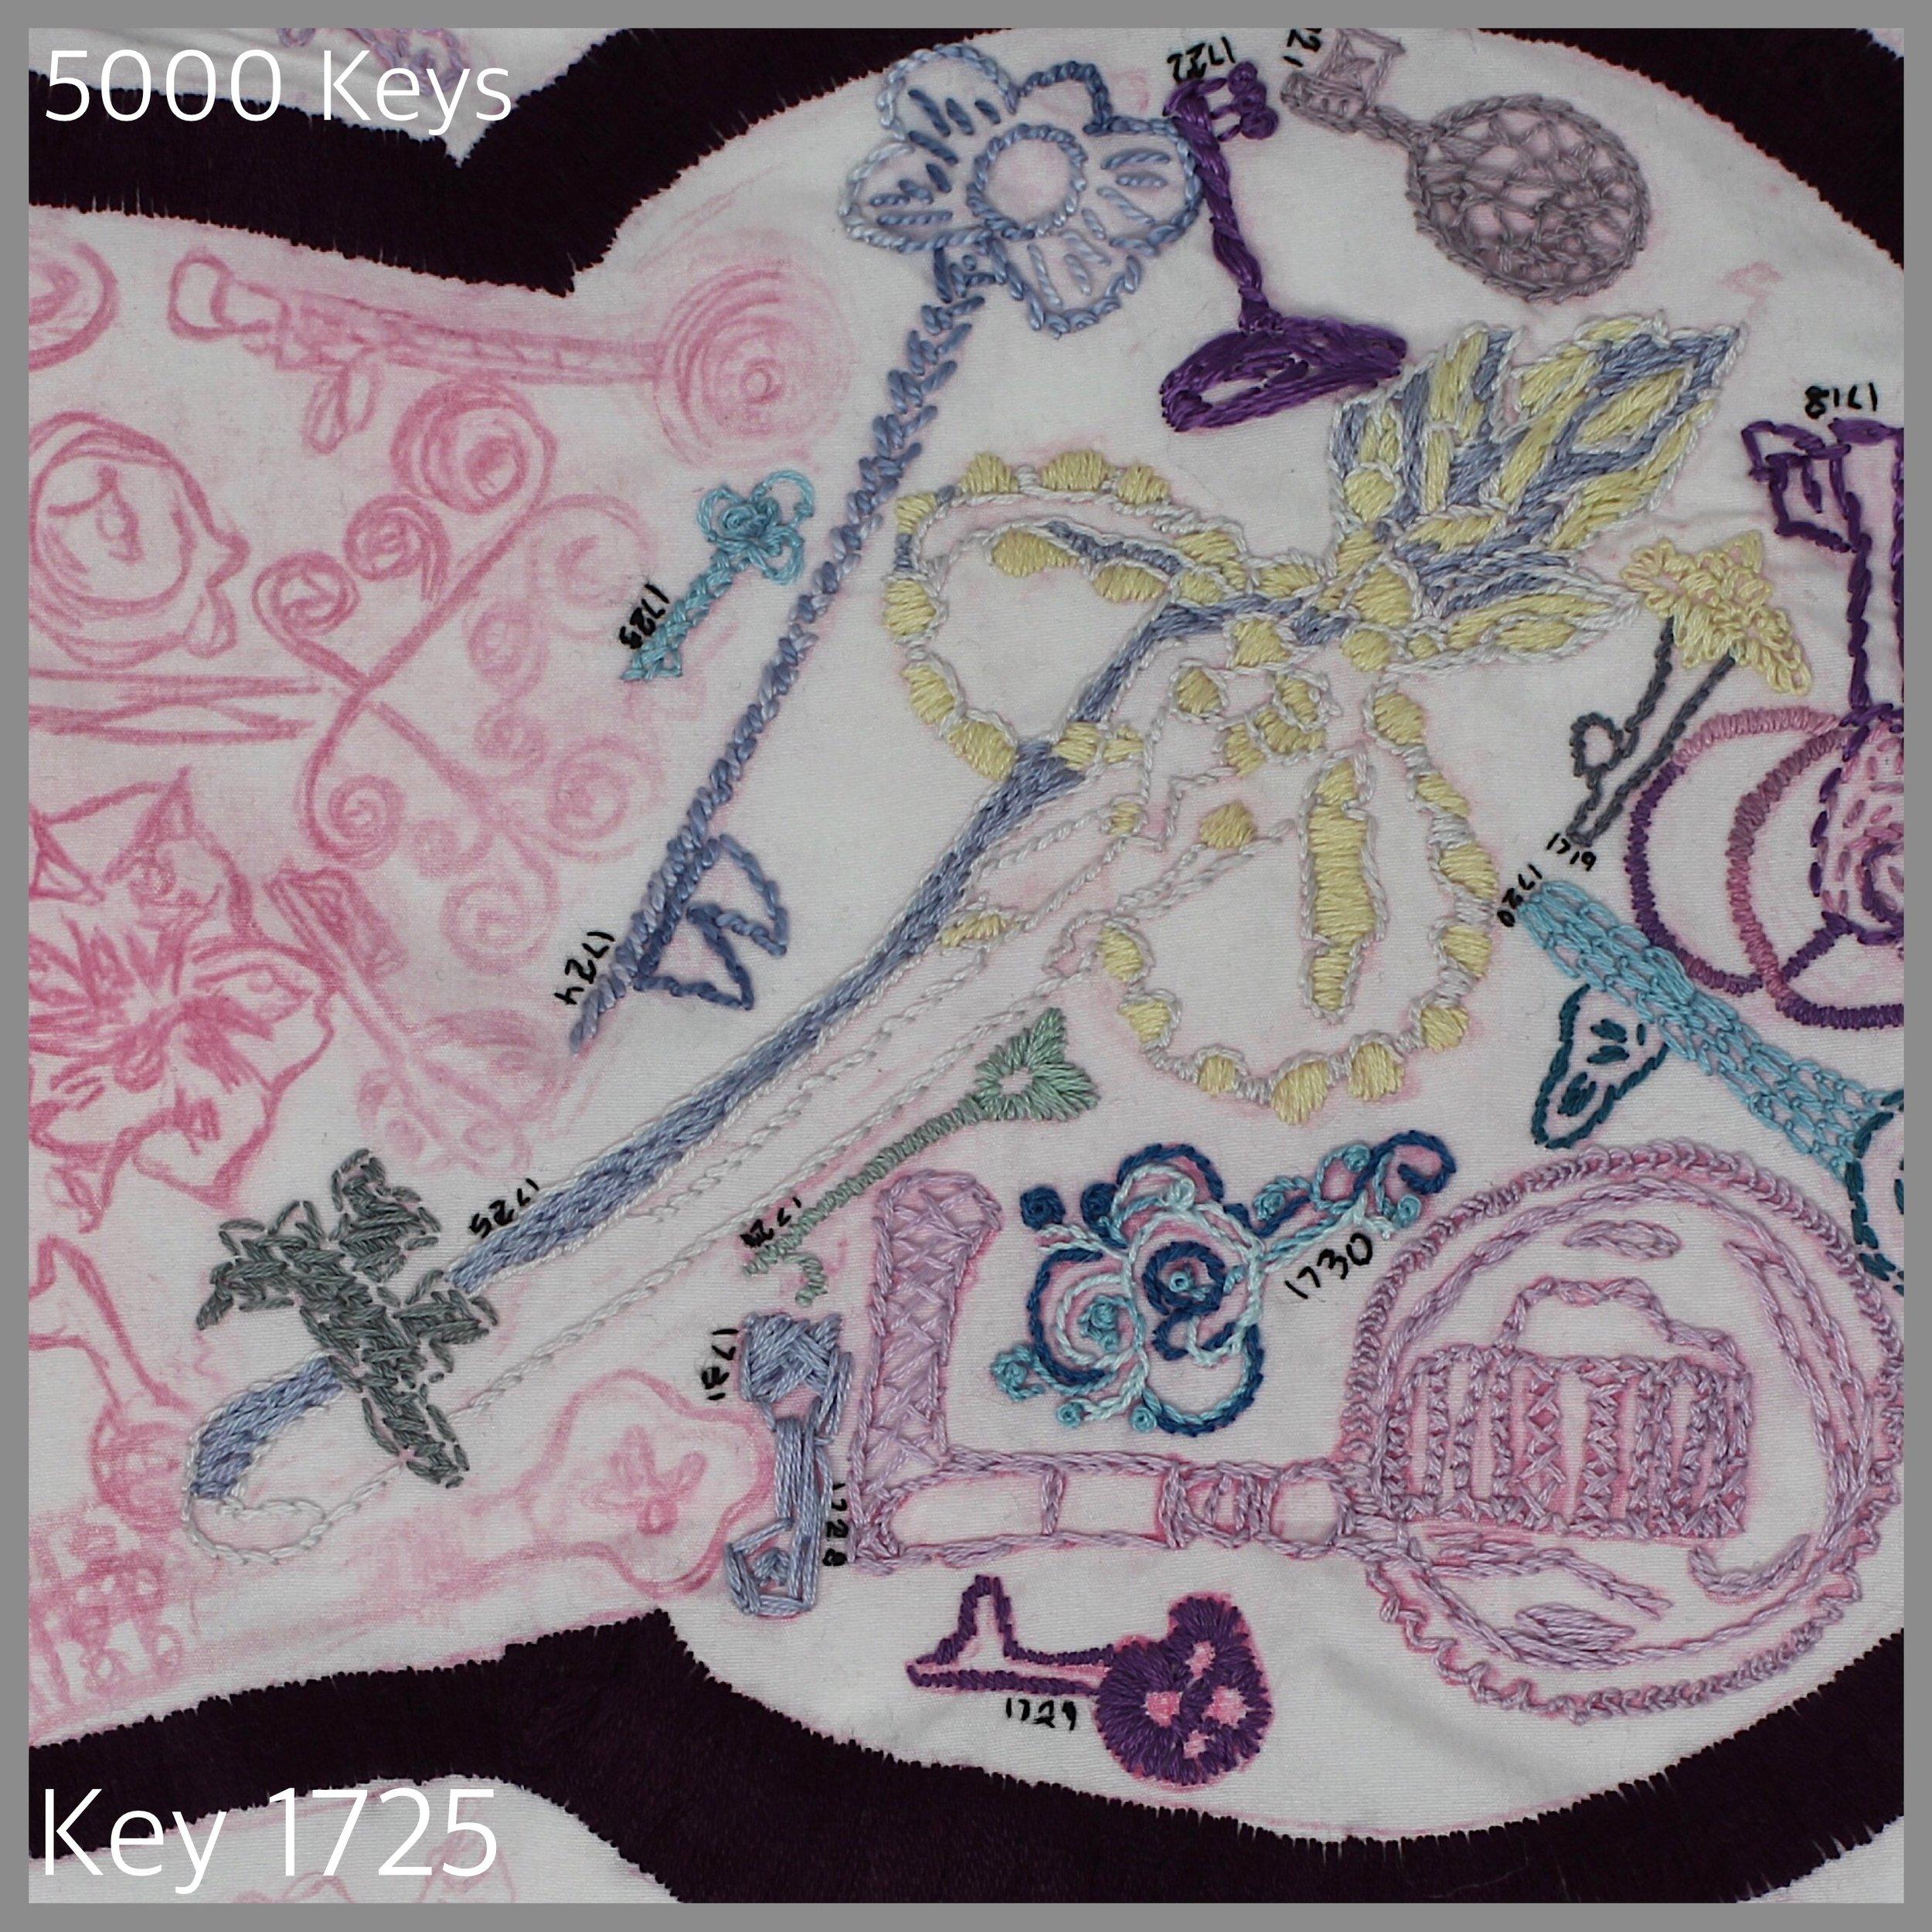 Key 1725 - 1.JPG